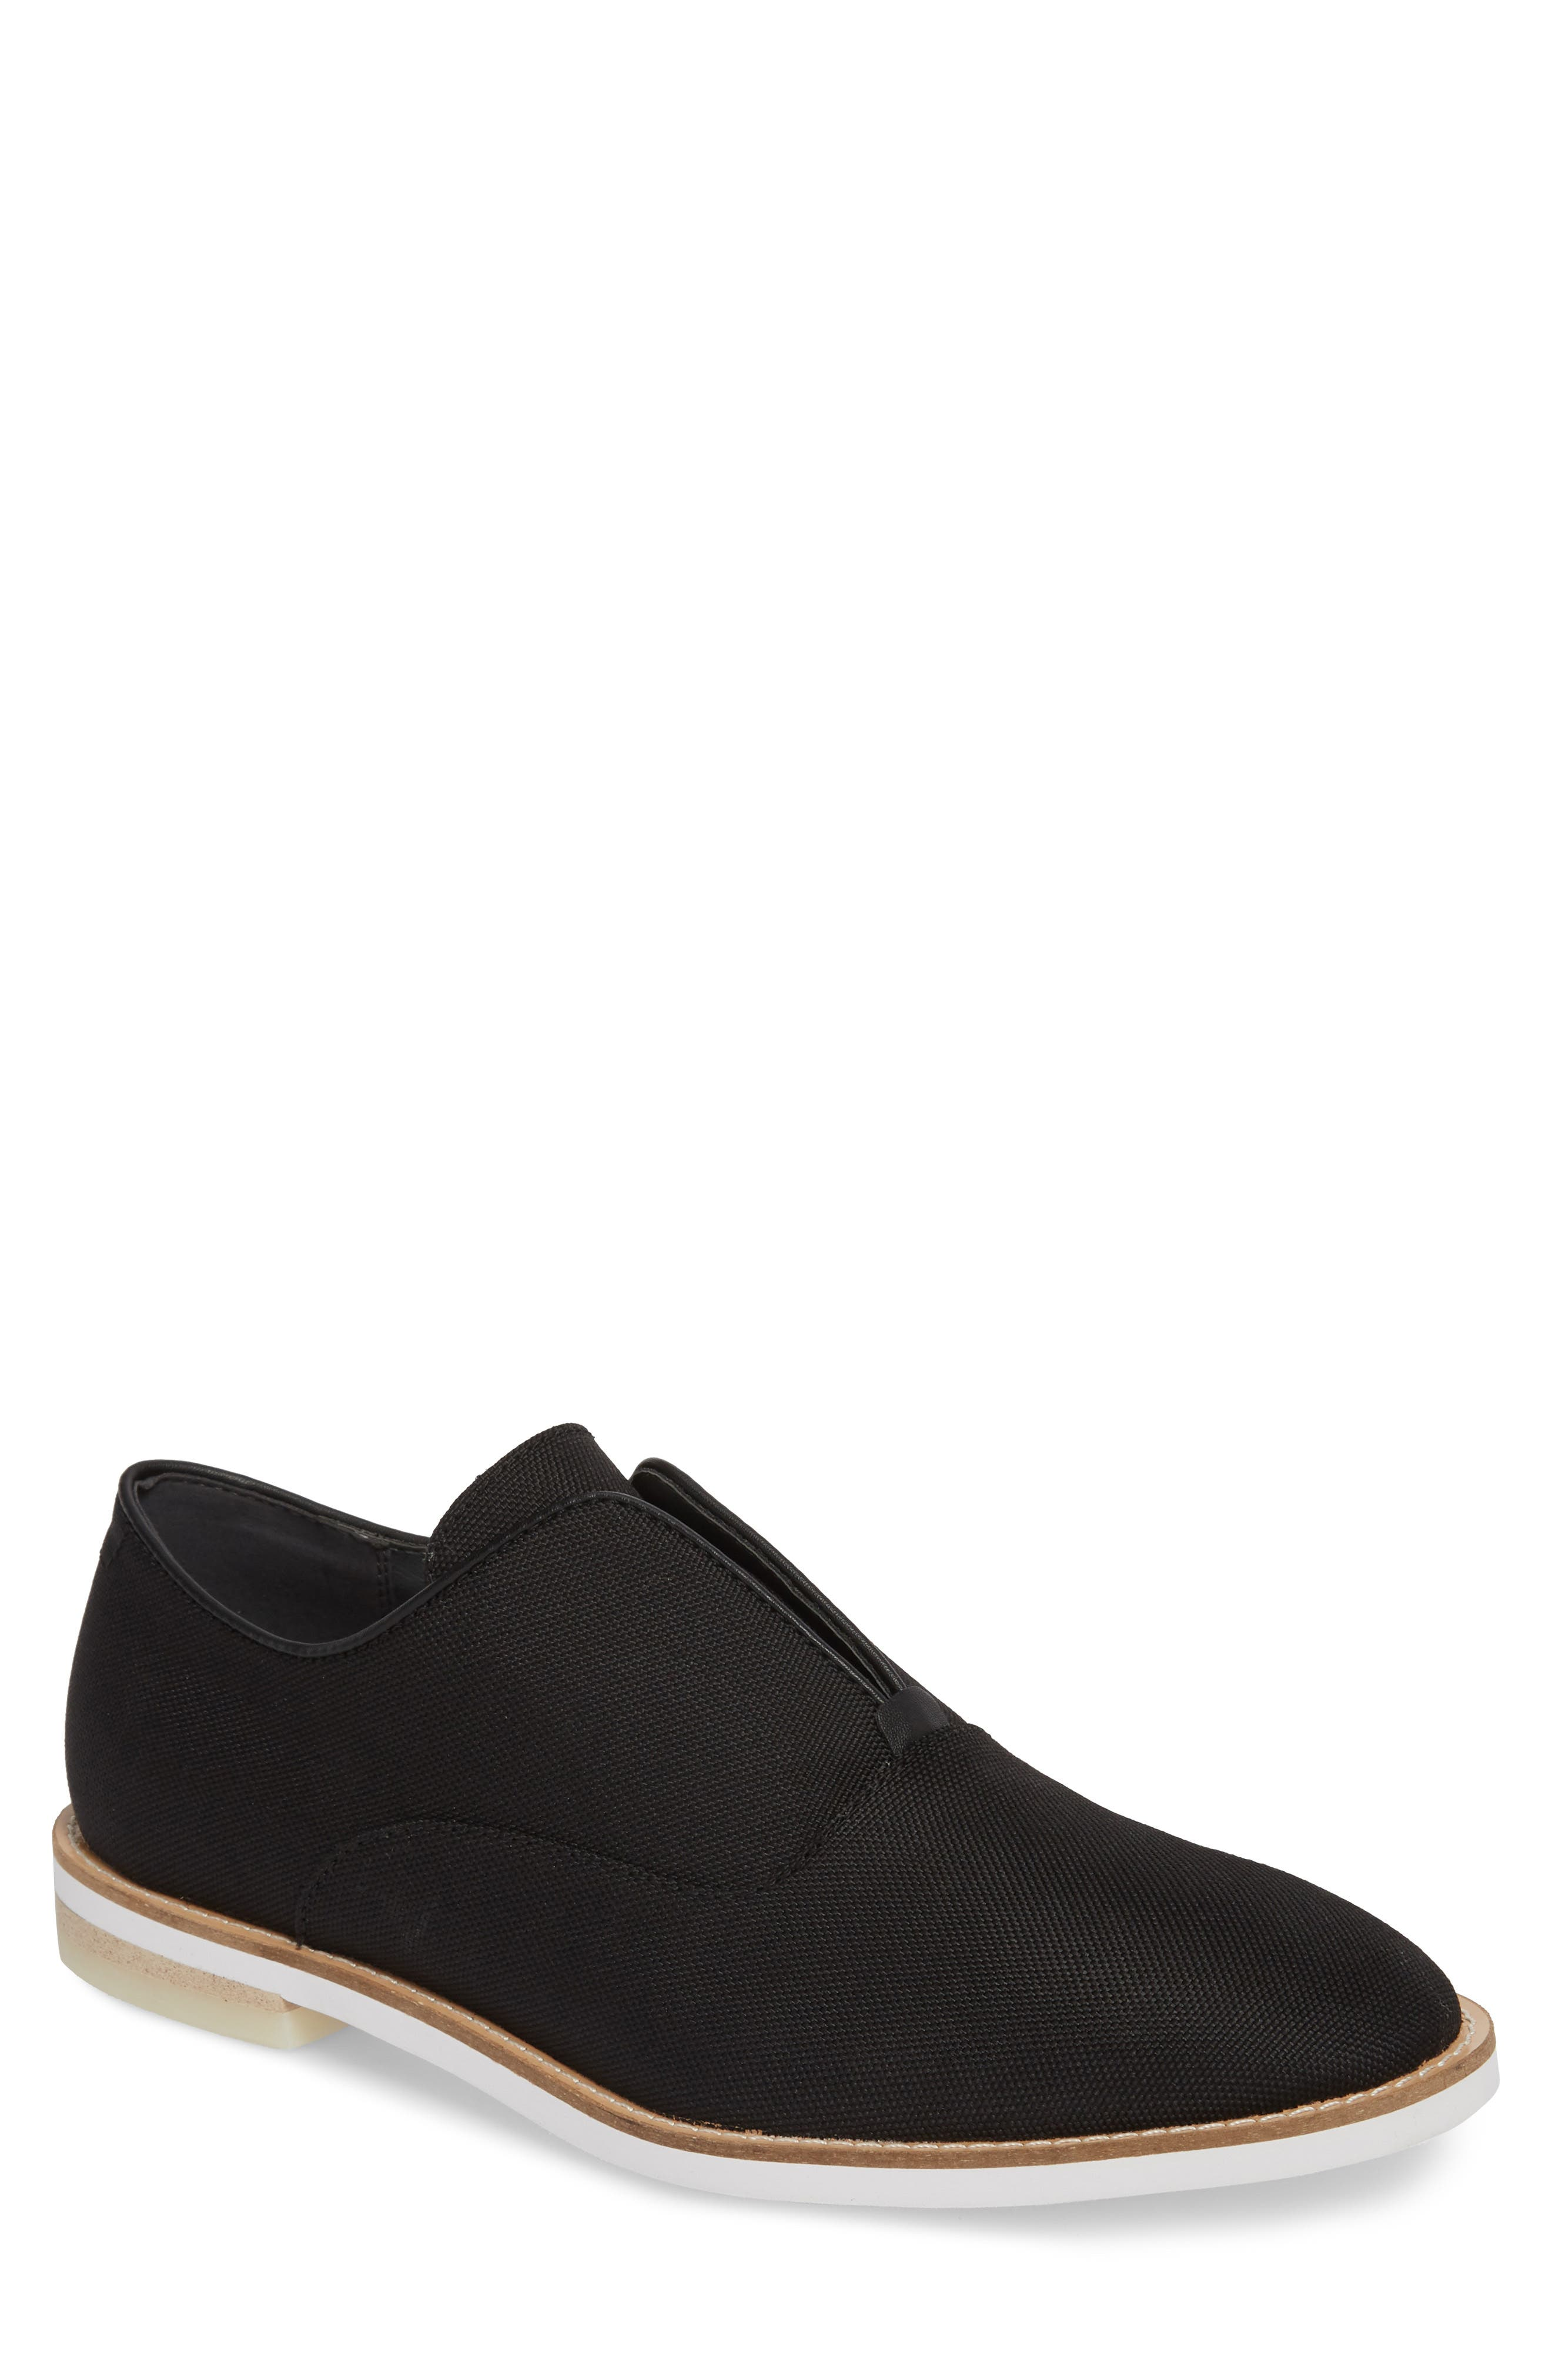 Auston Laceless Wingtip Oxford,                         Main,                         color, Black Nylon